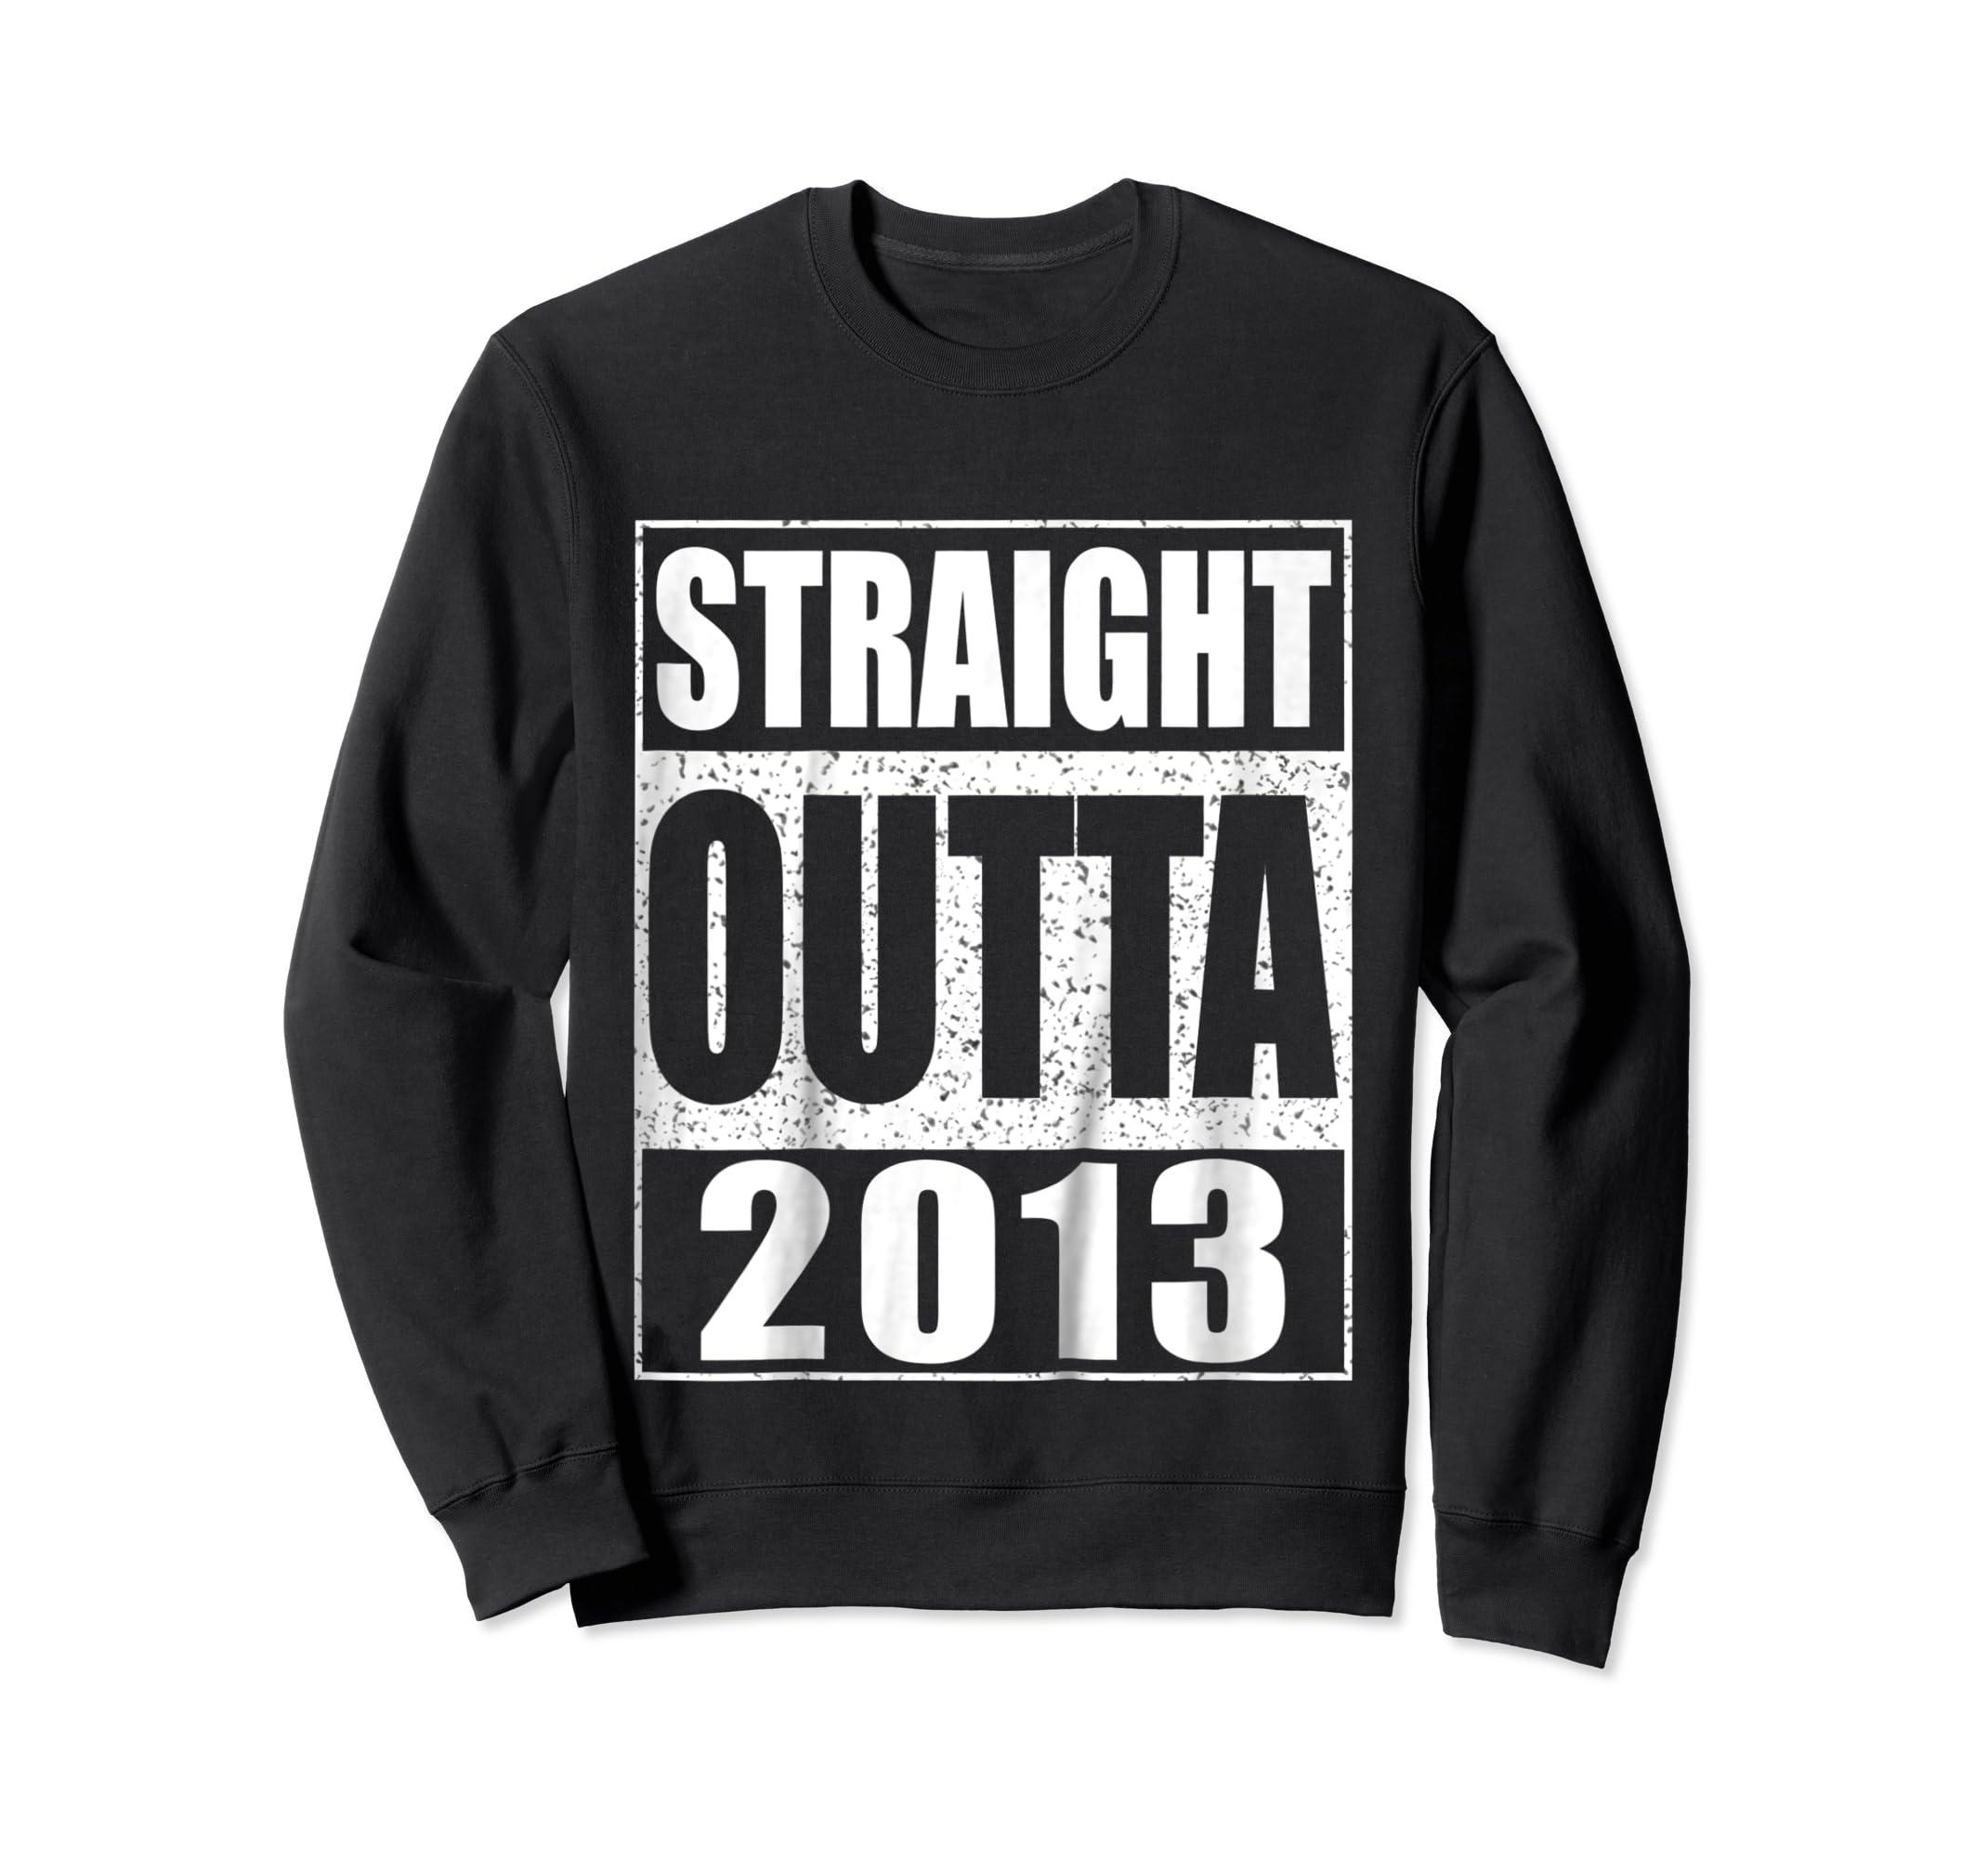 Kids Straight Outta 2013 T-Shirt 6th Birthday Gift Shirt-Sweatshirt-Black